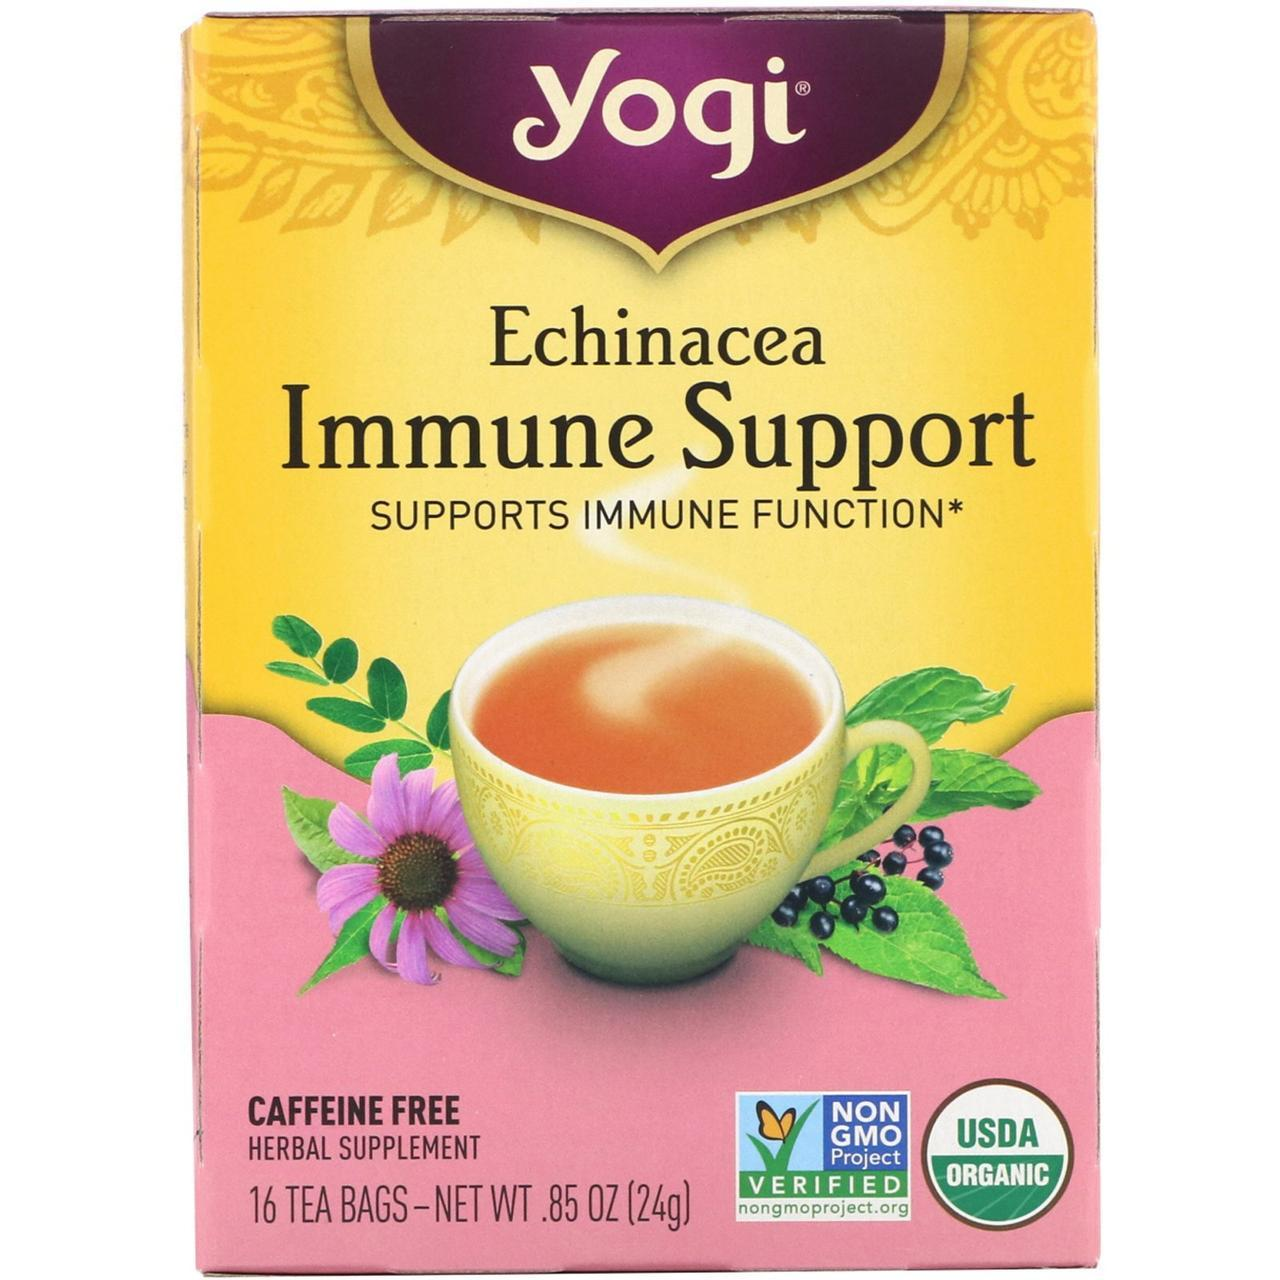 Echinacea Immune Support, без кофеїну, 16 чайних пакетиків, 24 г, Yogi Tea